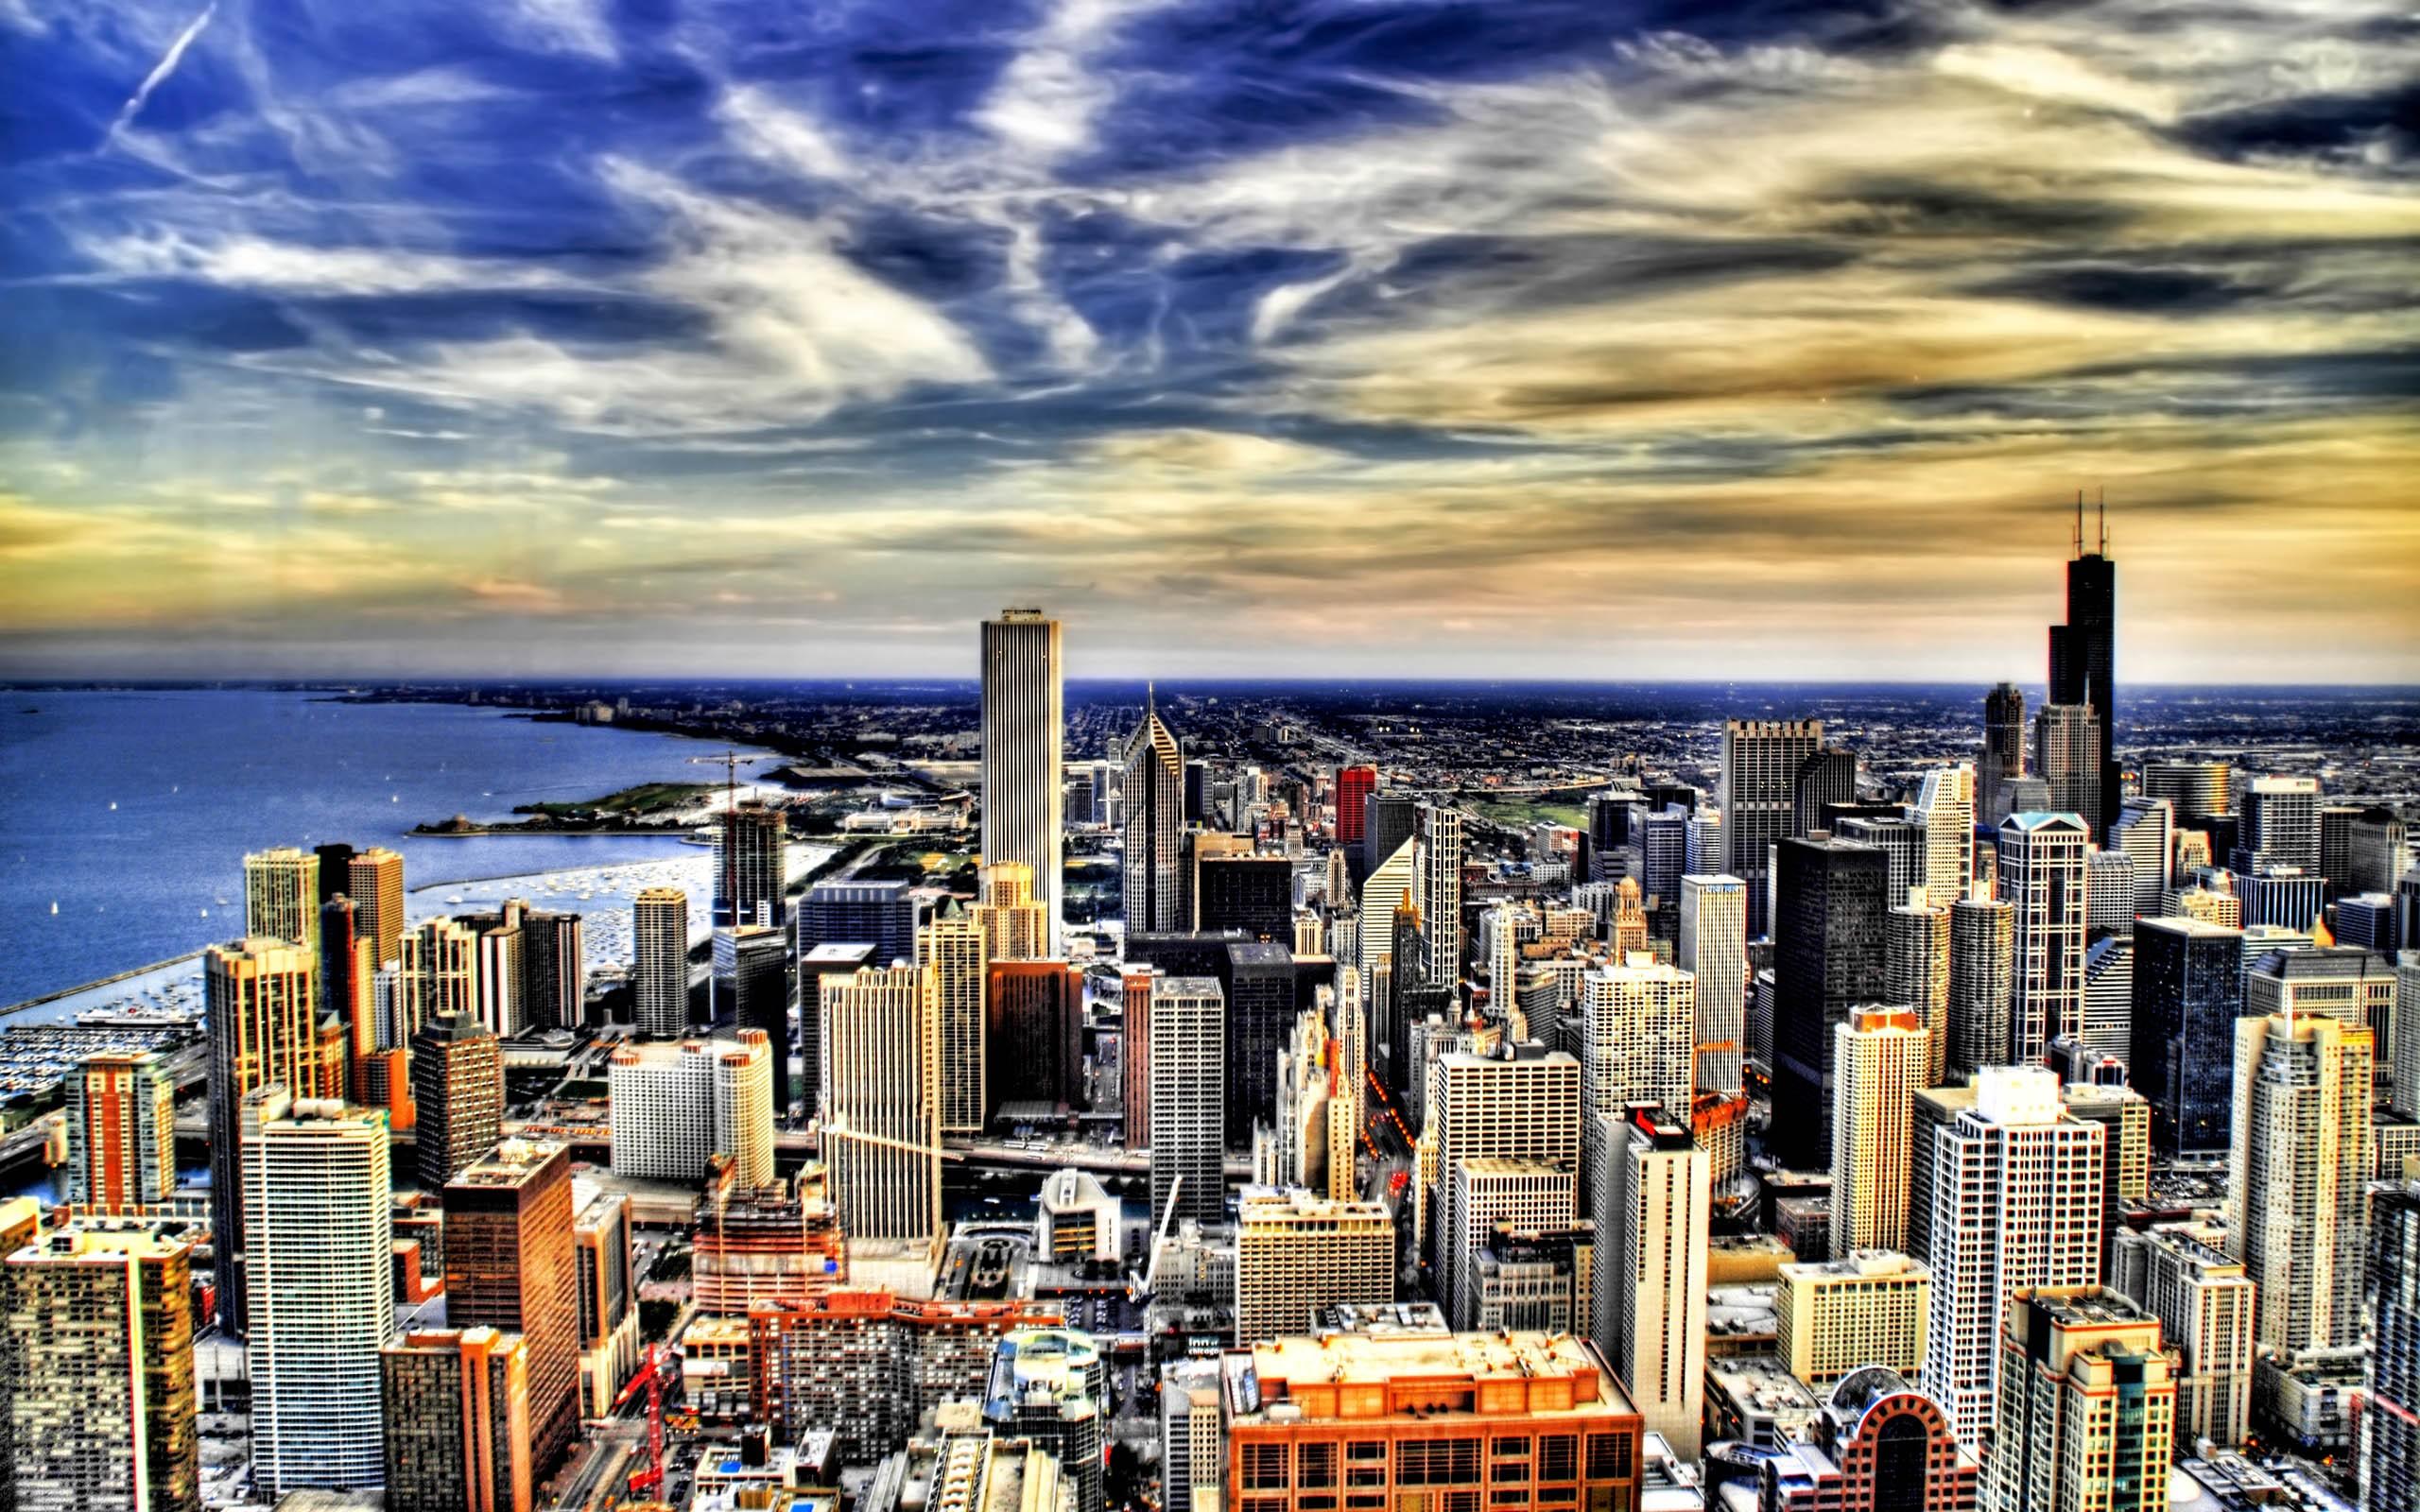 Chicago Illinois by Trey Ratcliff   Desktop Wallpaper 2560x1600